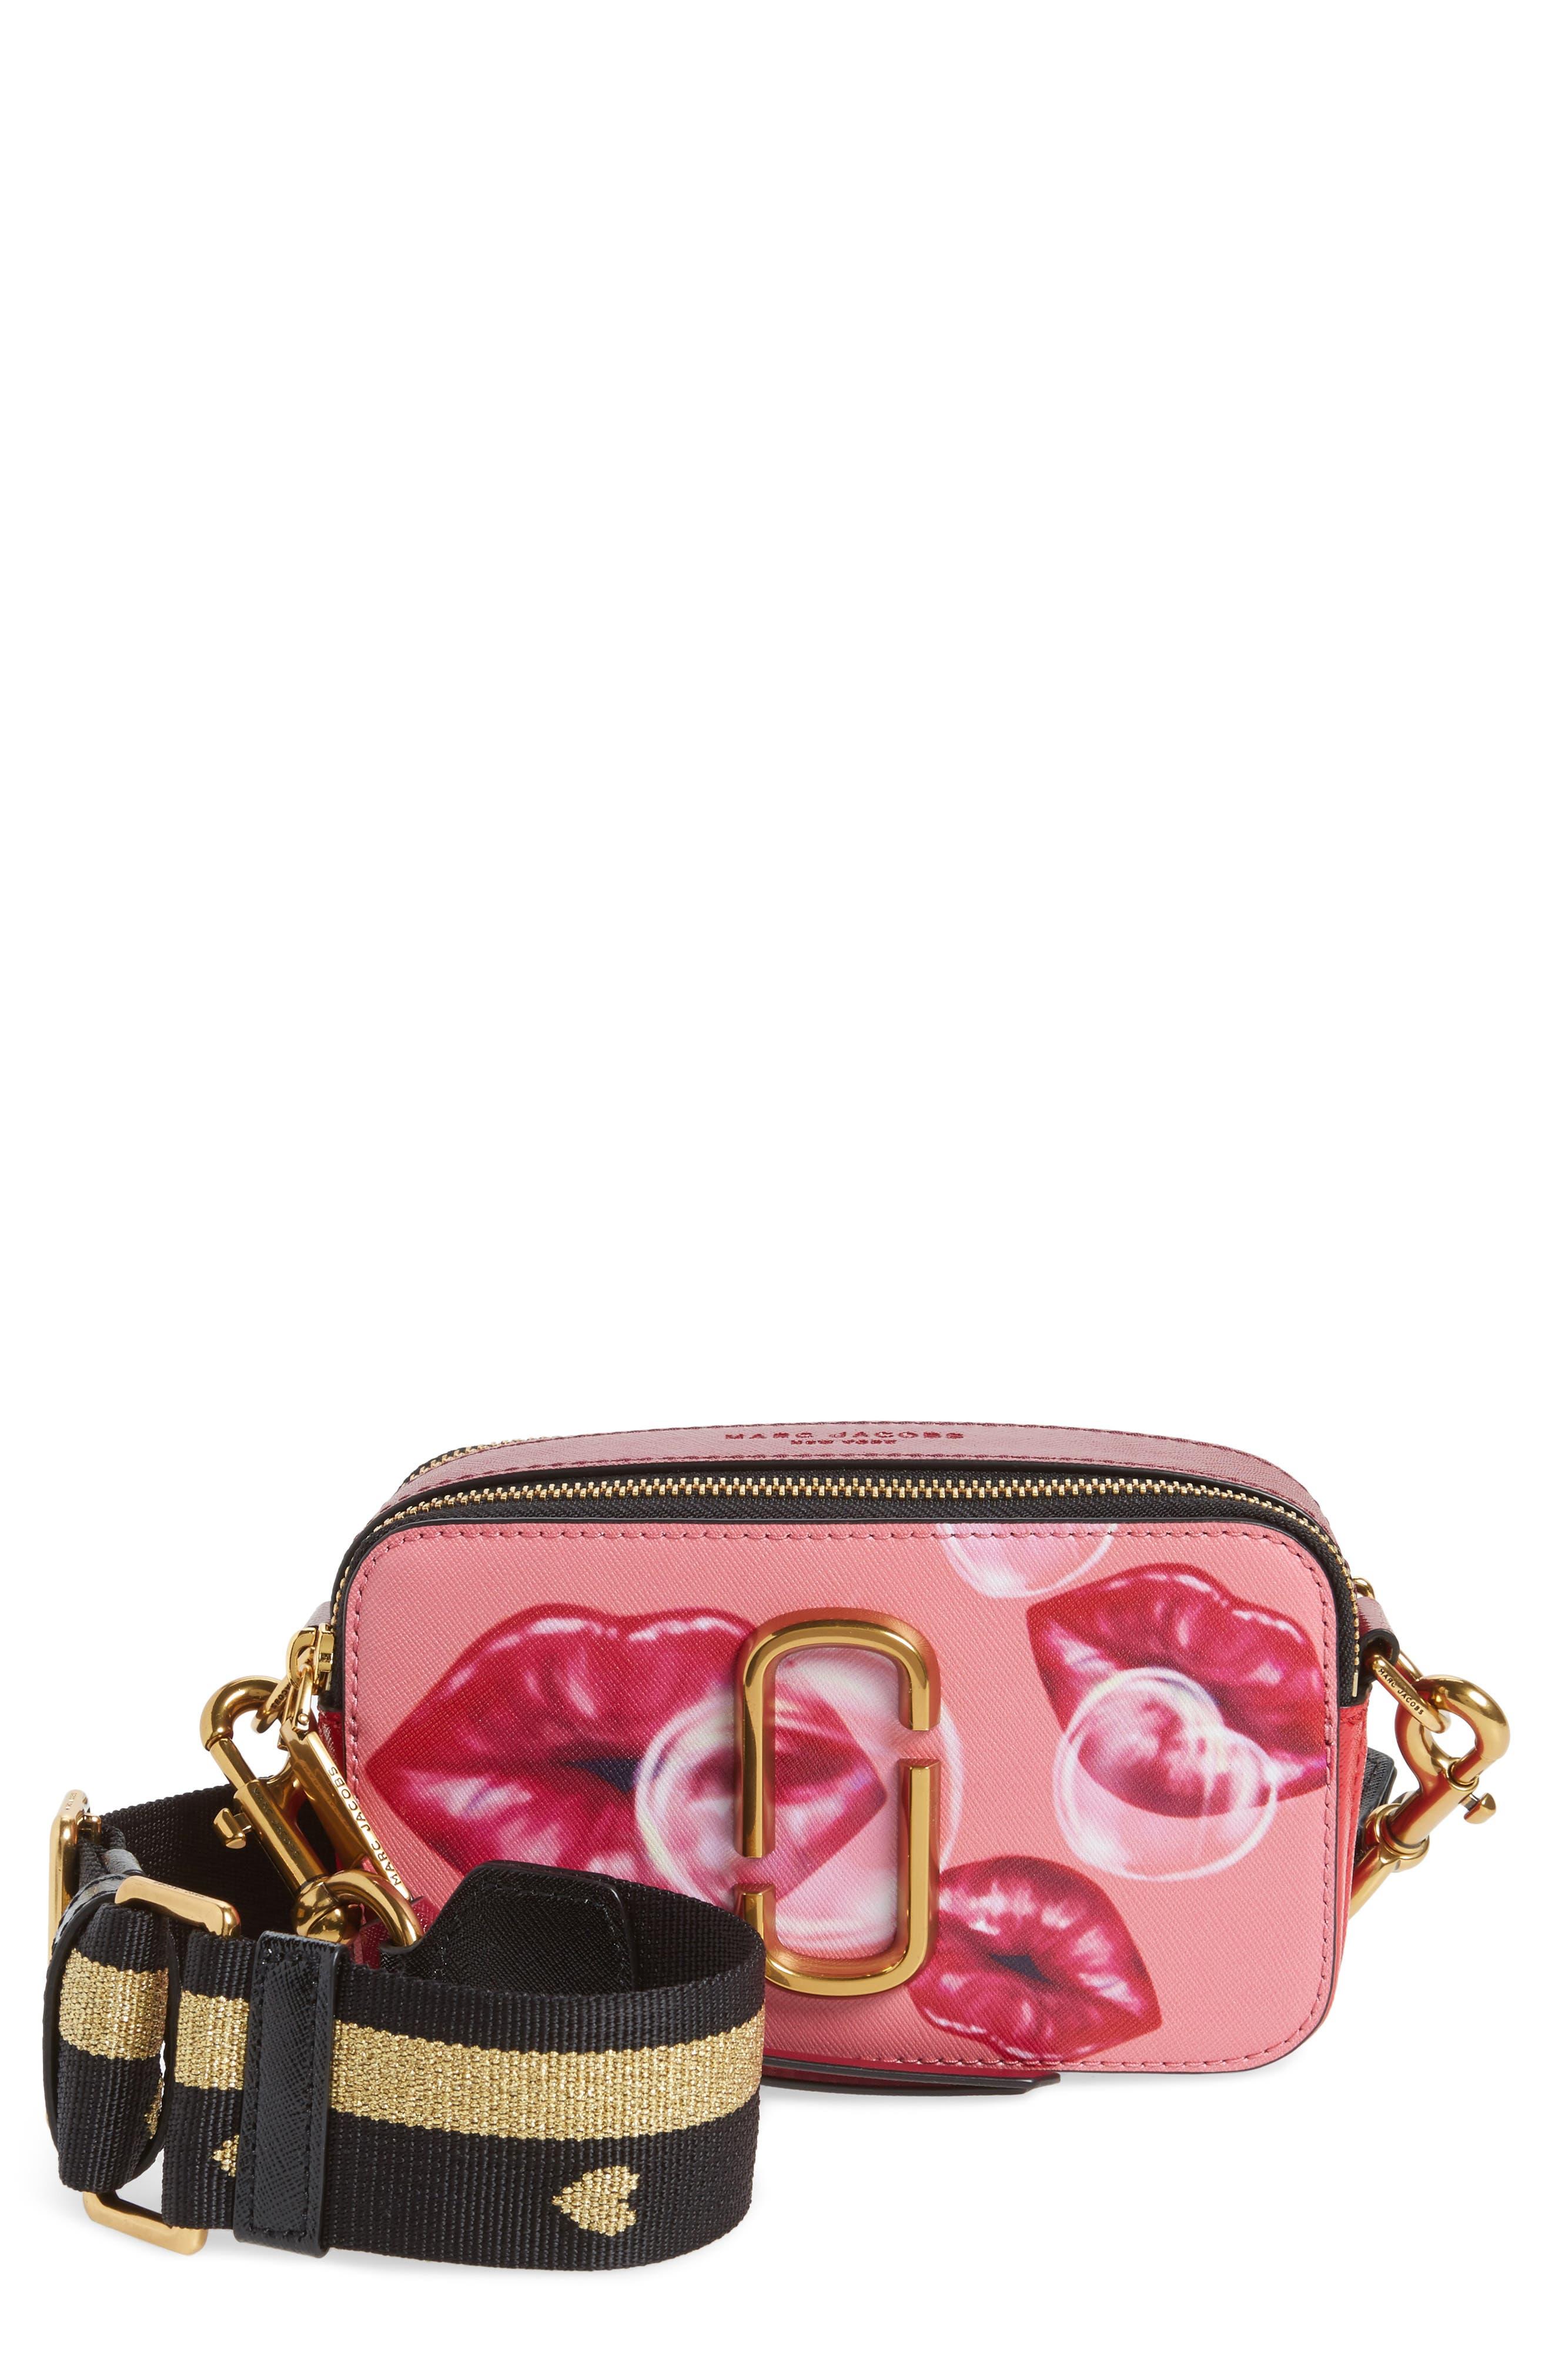 MARC JACOBS Snapshot Printed Lips Leather Crossbody Bag